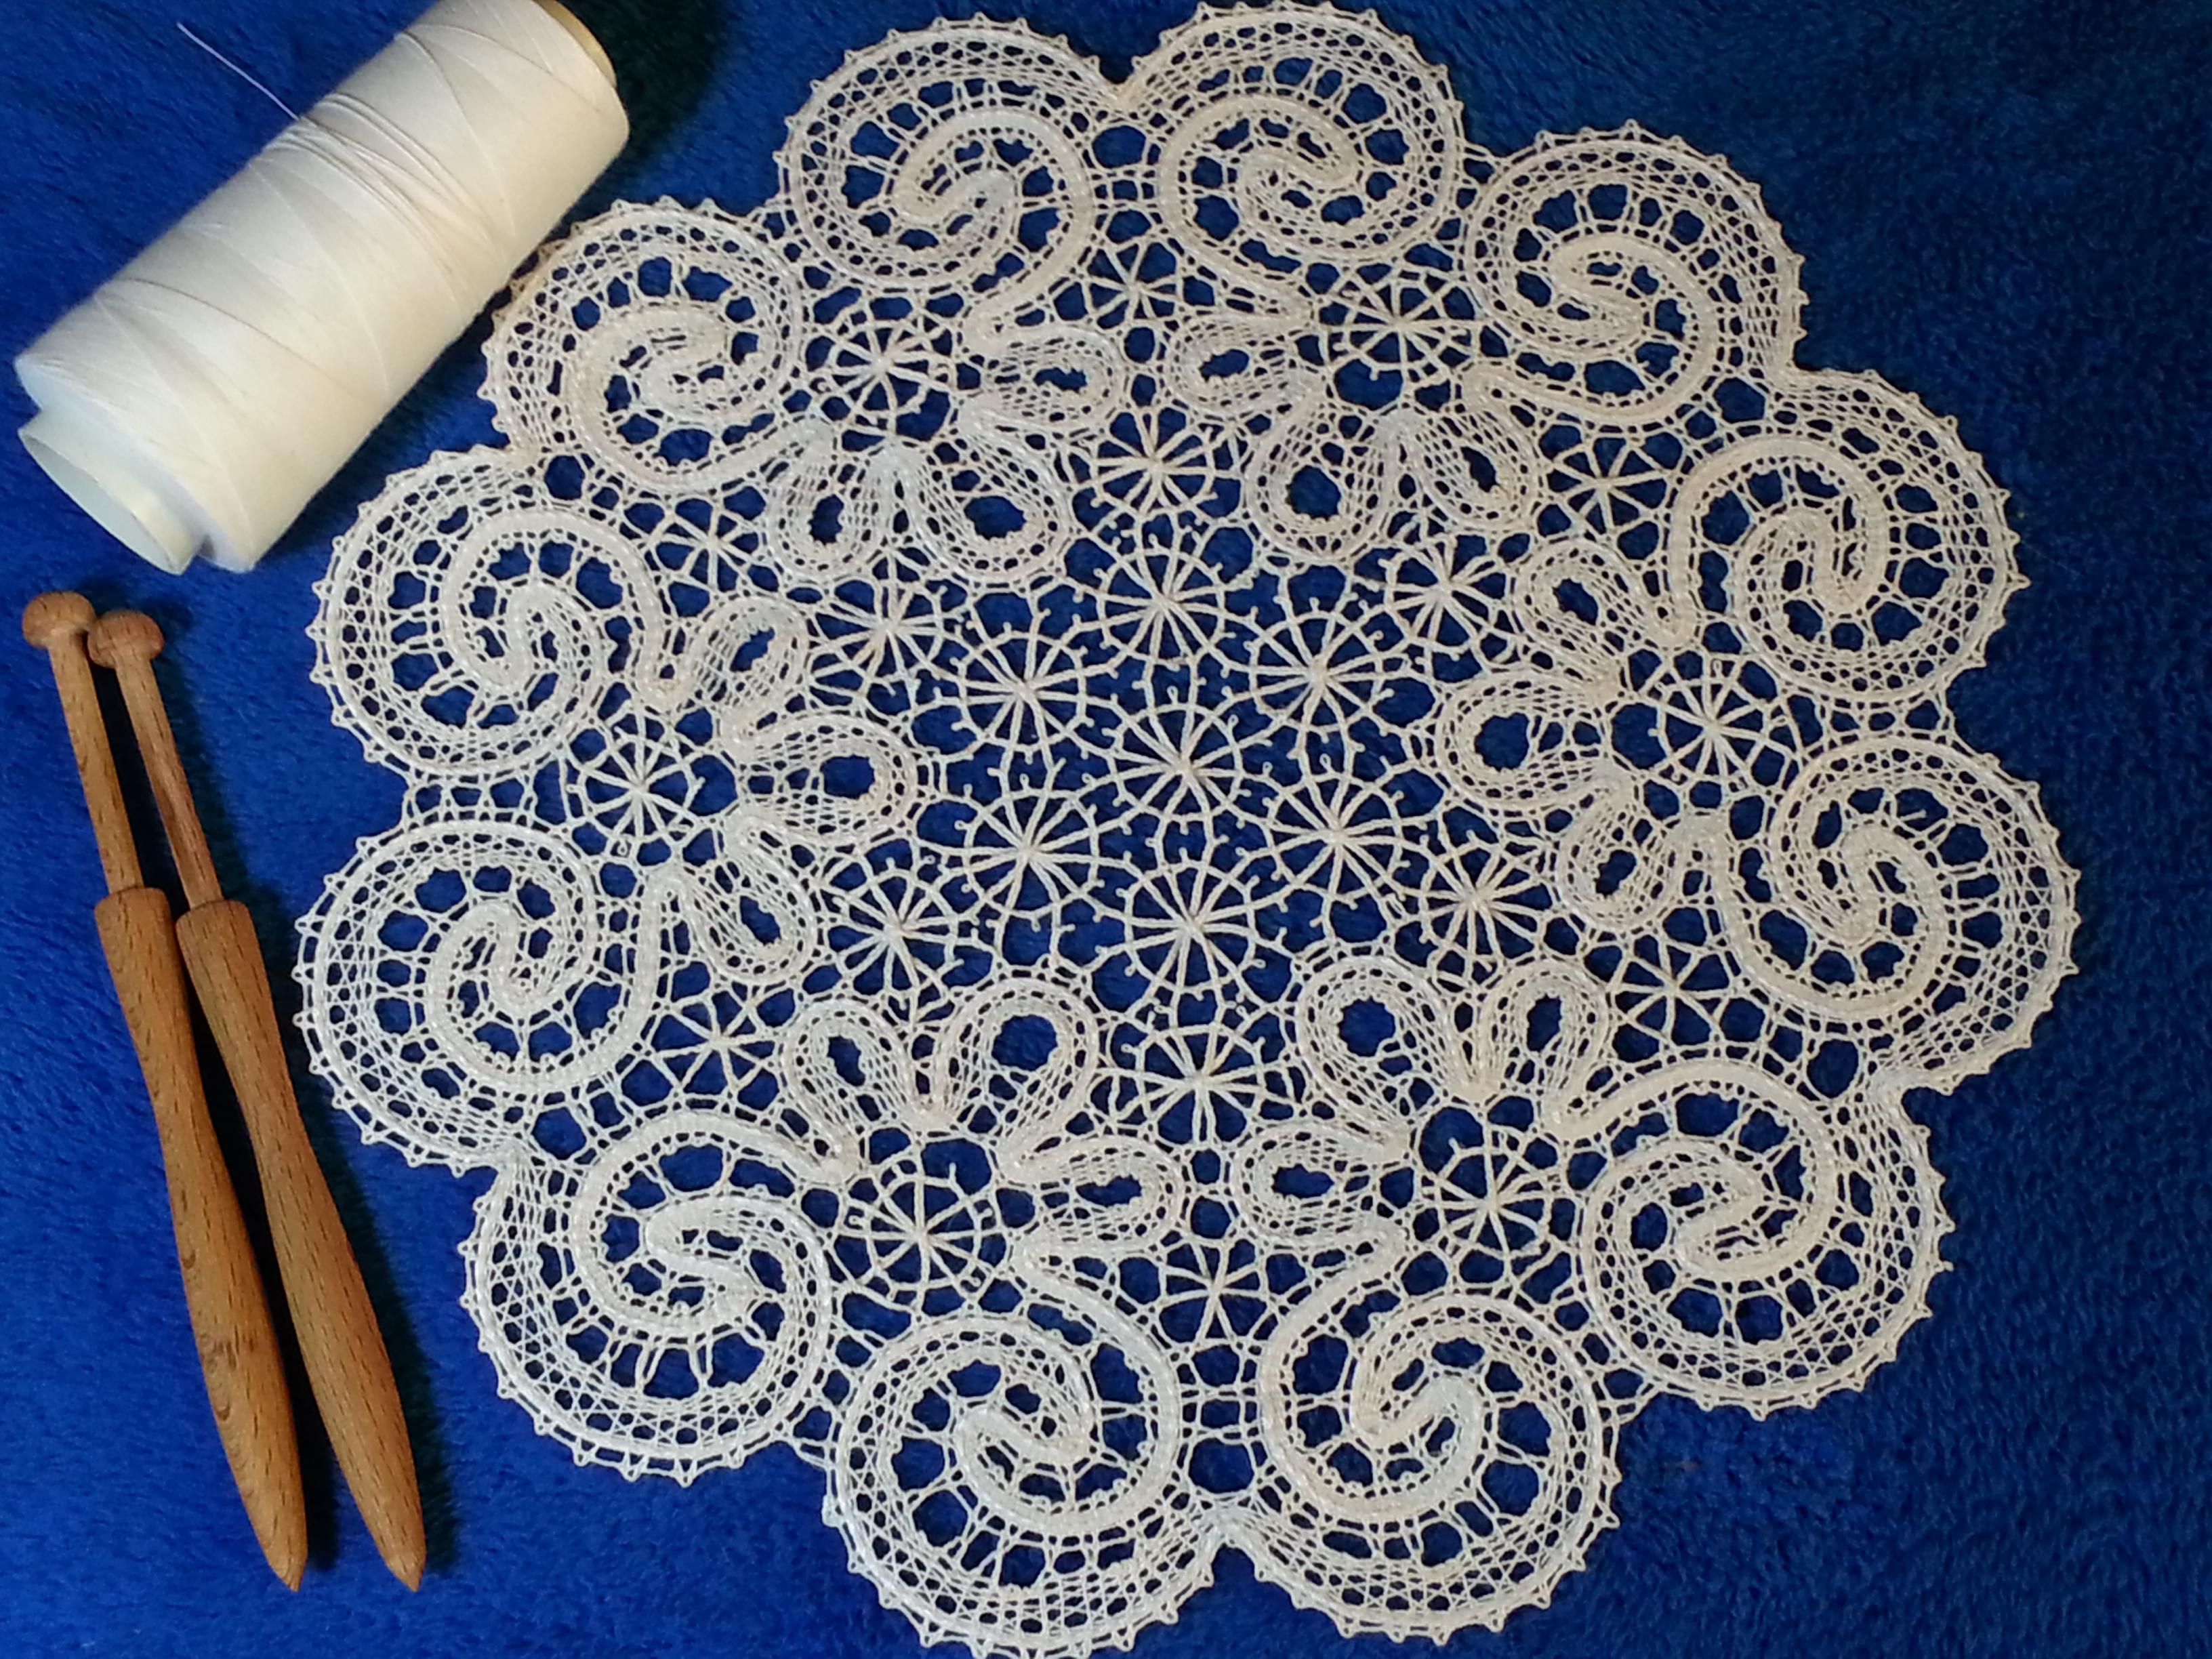 Кружева плетённых на коклюшках